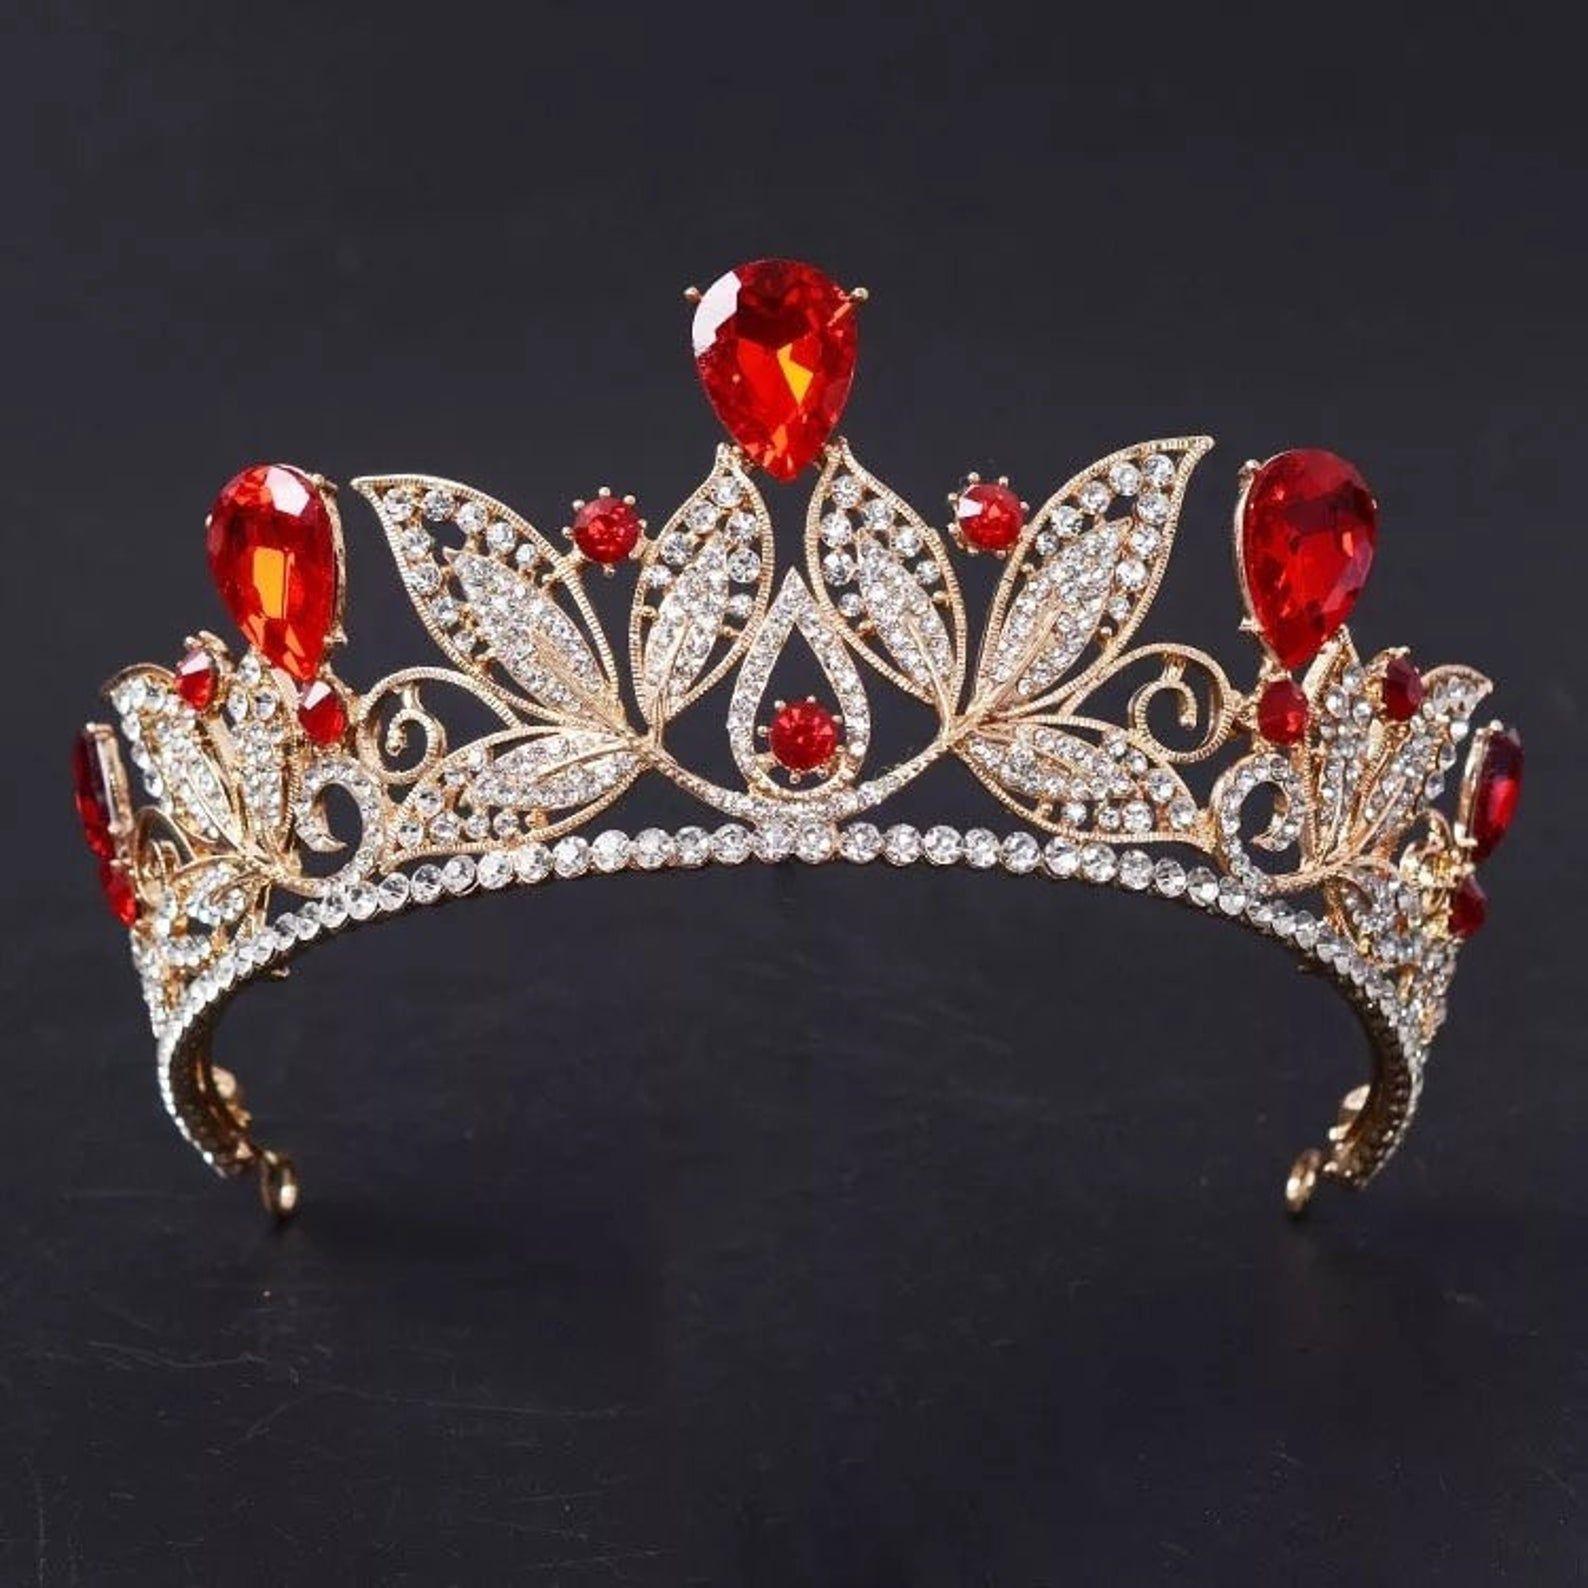 Vintage Red Crystal Bridal Tiara Fashion Gold Rhinestone Diadem for Women Wedding Dress Hair Jewelry Princess Crown Accessories,weddings